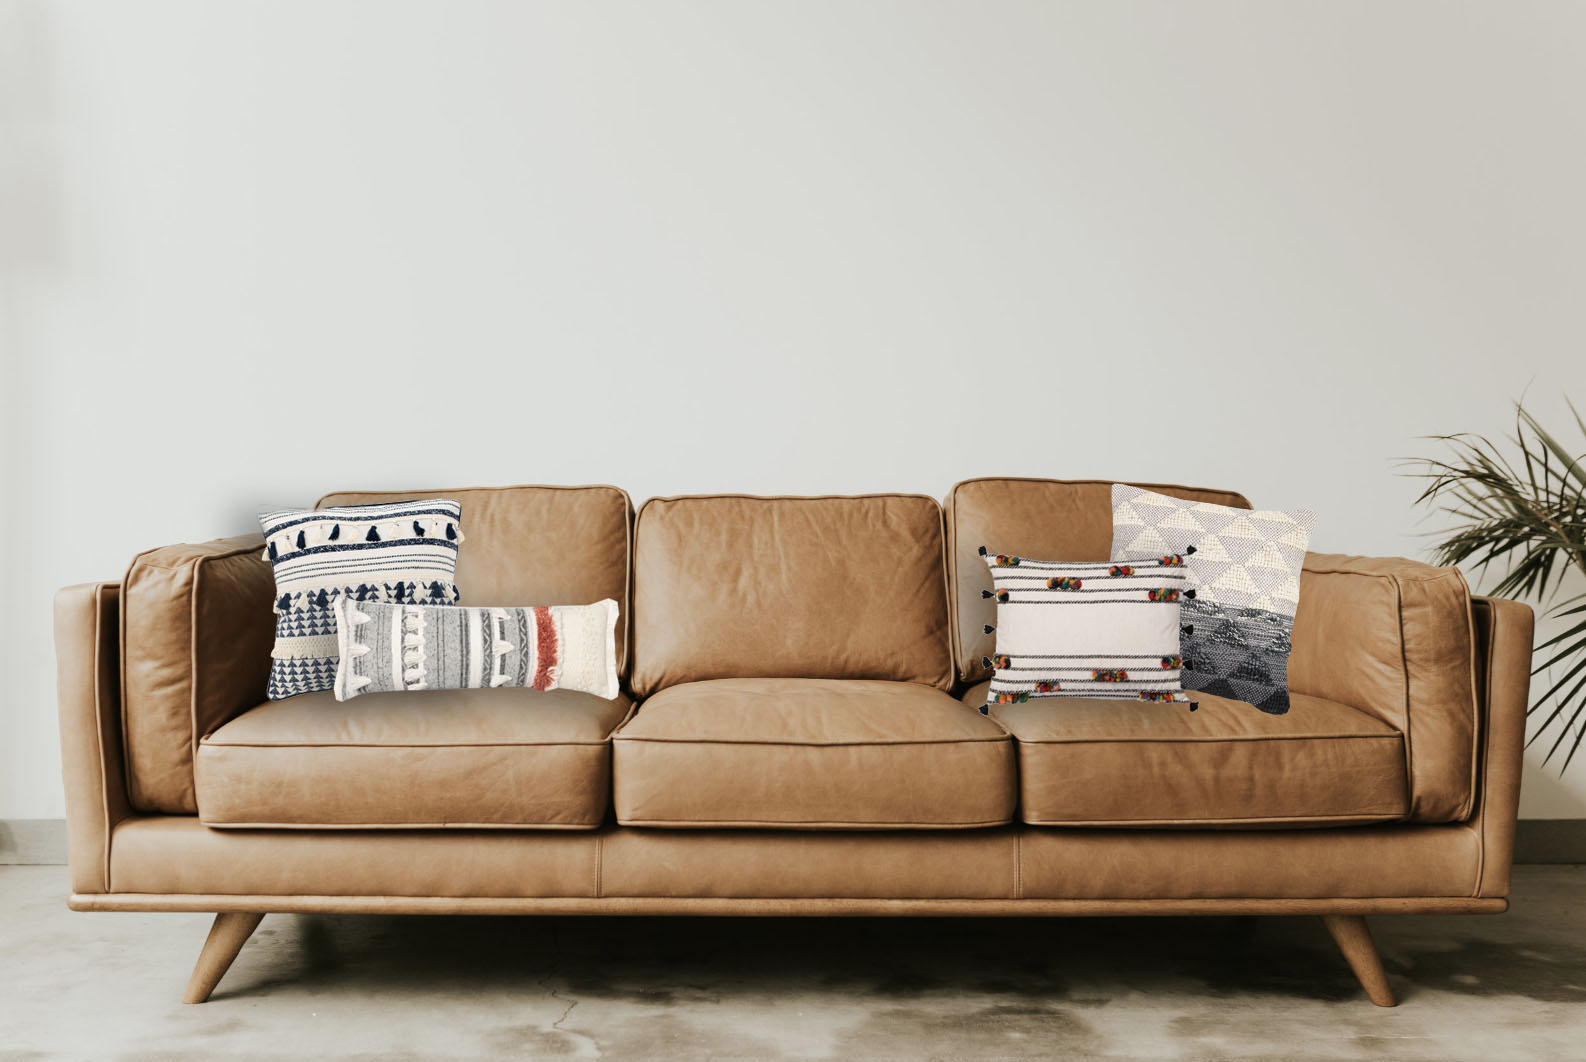 Couch_Boho Throw Pillows.jpg